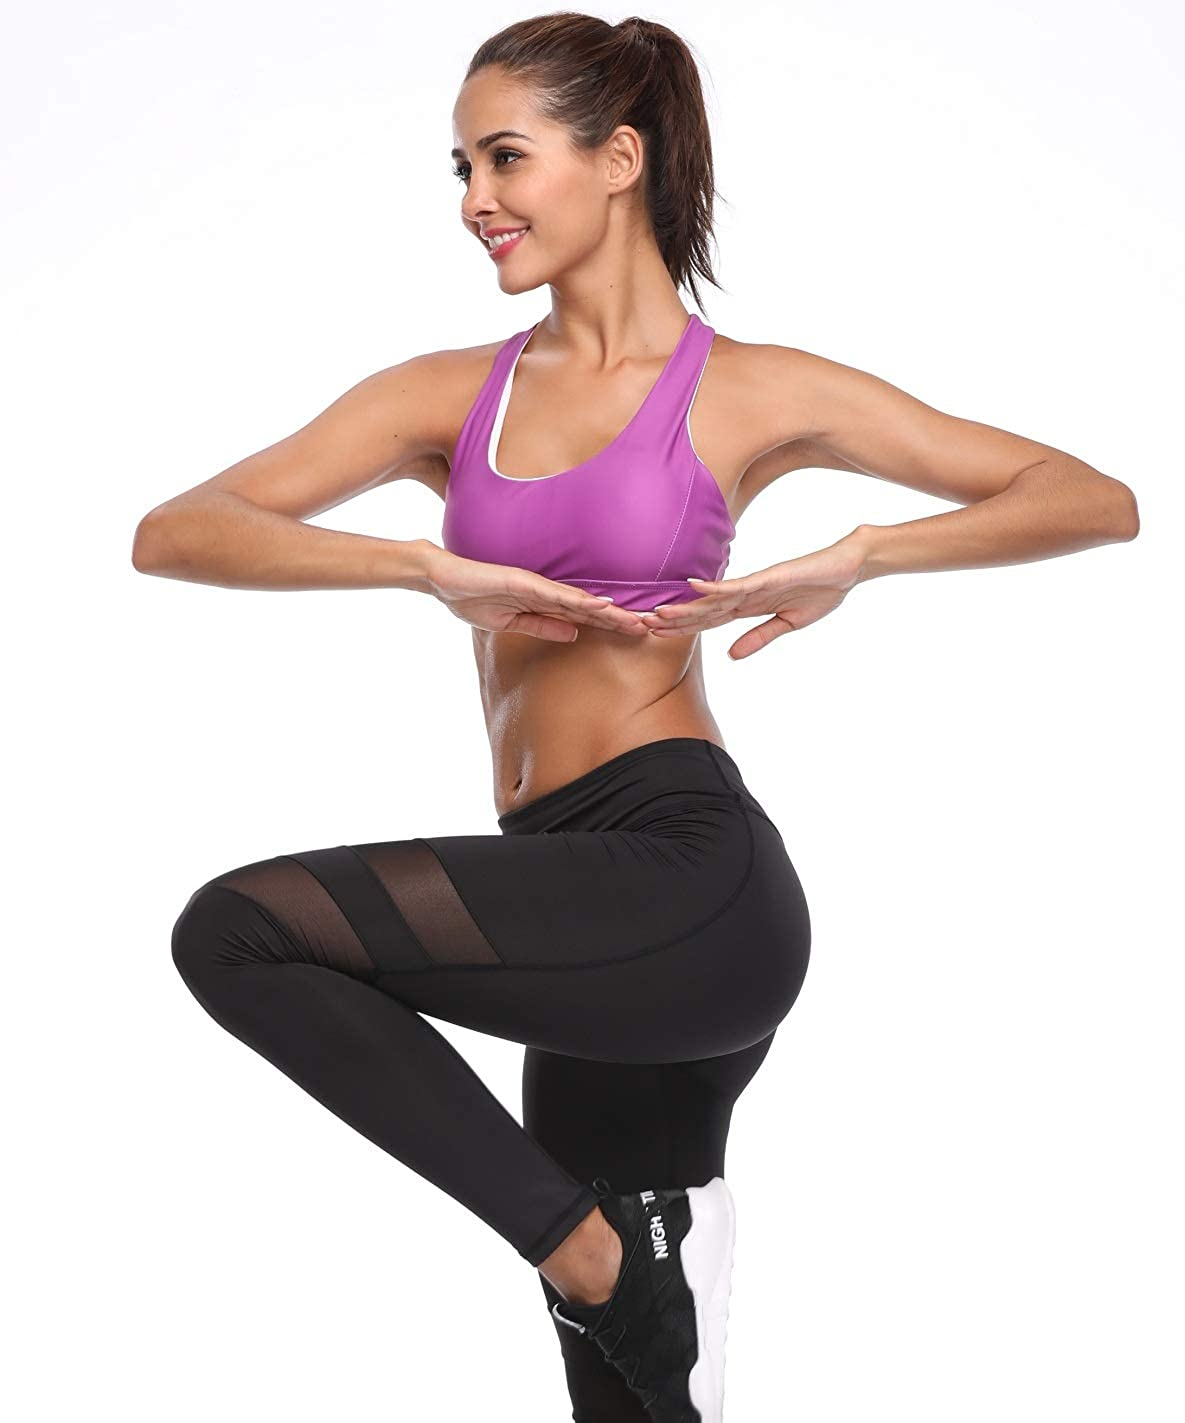 aab600bbbf0b74 Zida Women's Sports Bra Strappy Activewear Workout Yoga Sport Bra at Amazon  Women's Clothing store: